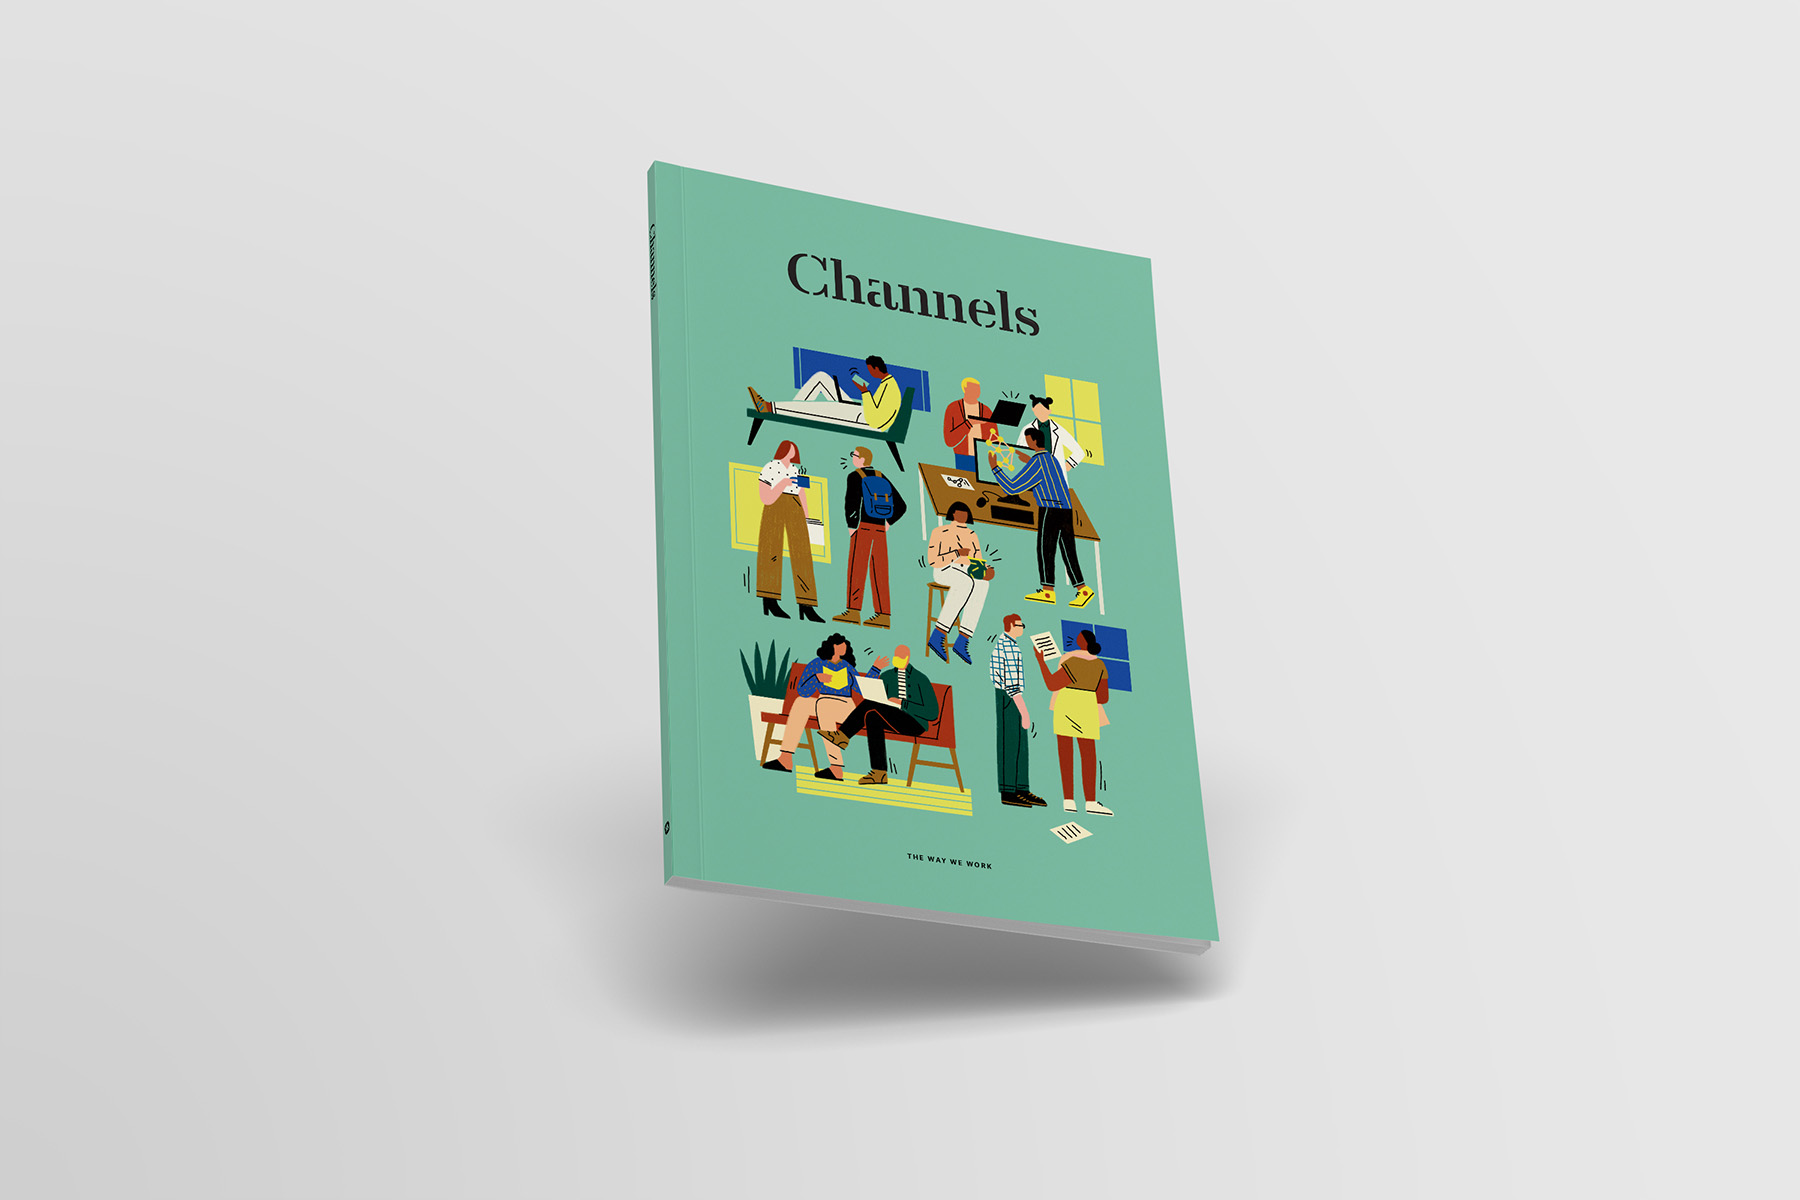 Slack+Channels+magazine+cover+design